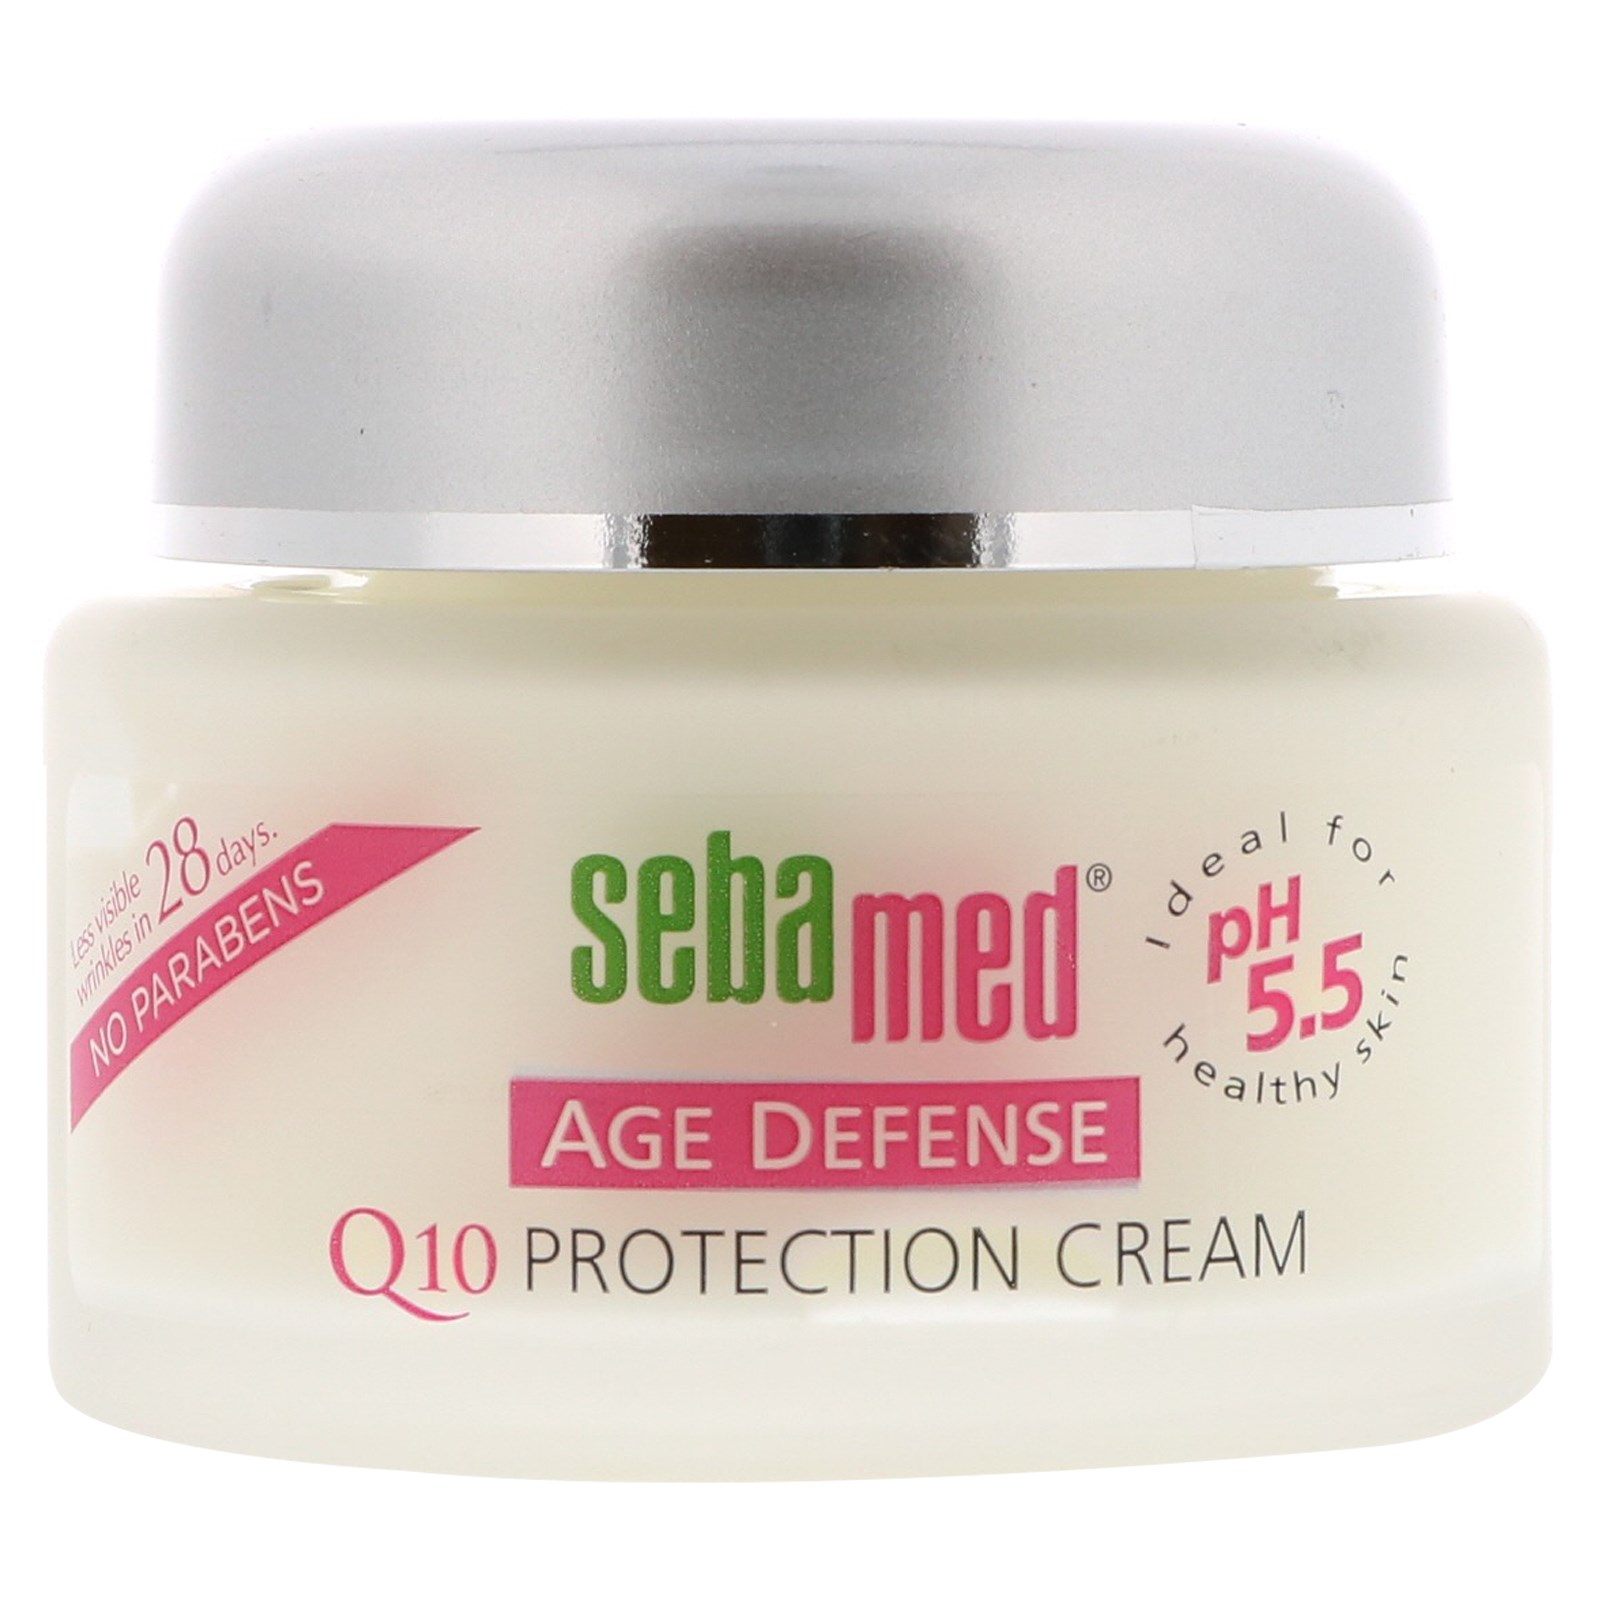 Physician Laboratories Seba Med Age Defense Protection Cream, 1.69 oz Sea Breeze Astringent Original Formula, Classic Clean 10 oz (Pack of 2)